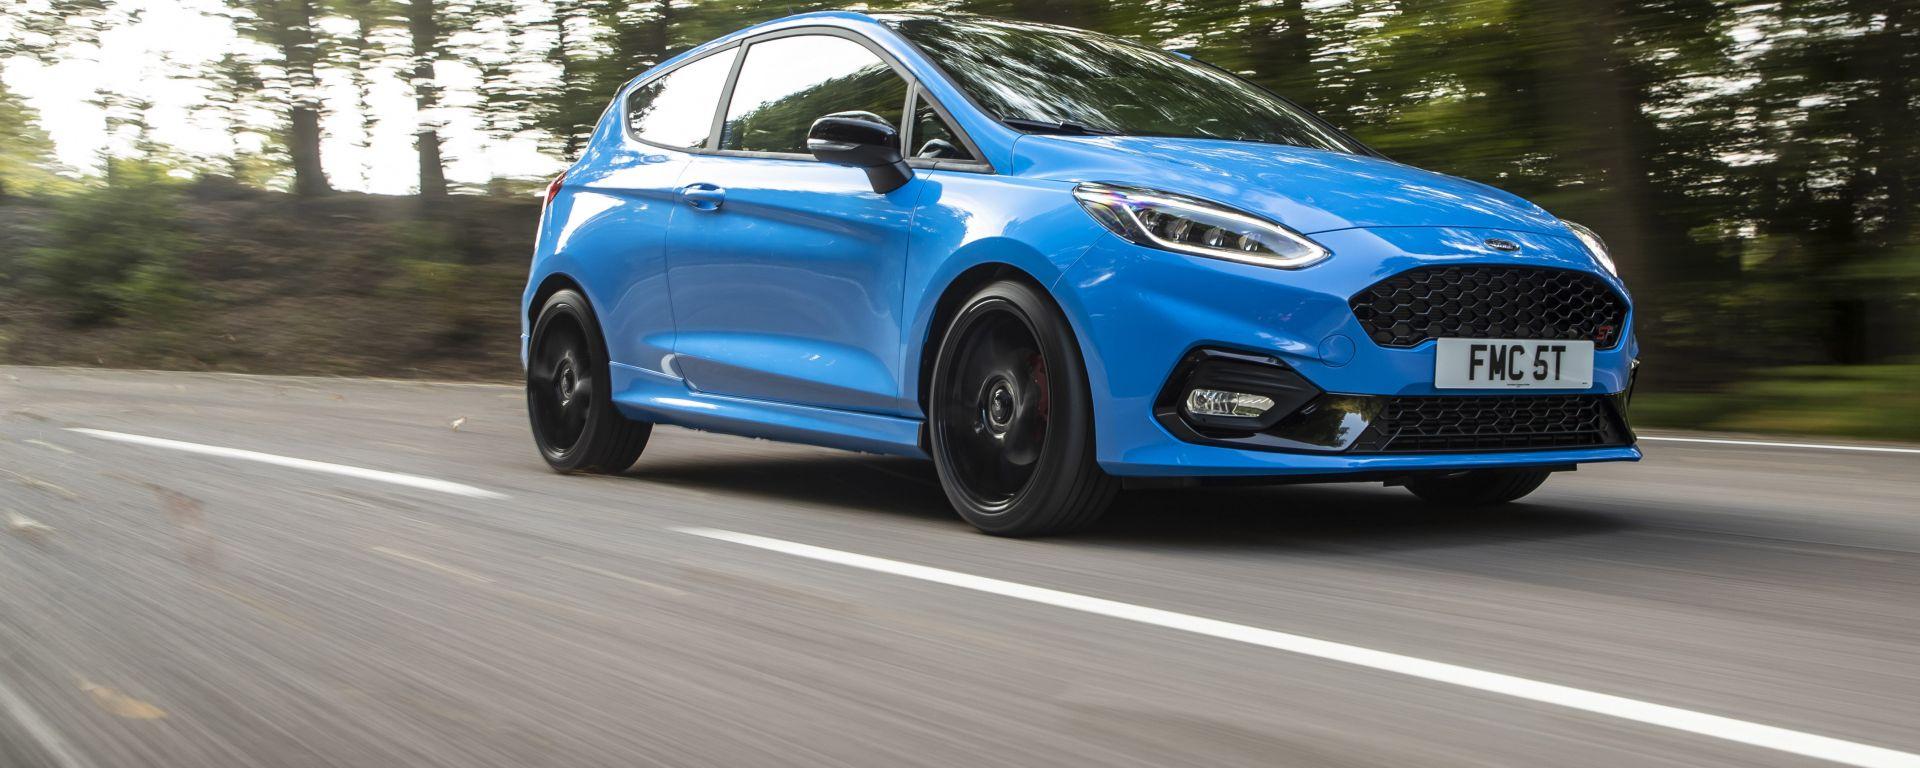 Ford Fiesta ST Edition: una hot hatch a tiratura limitata